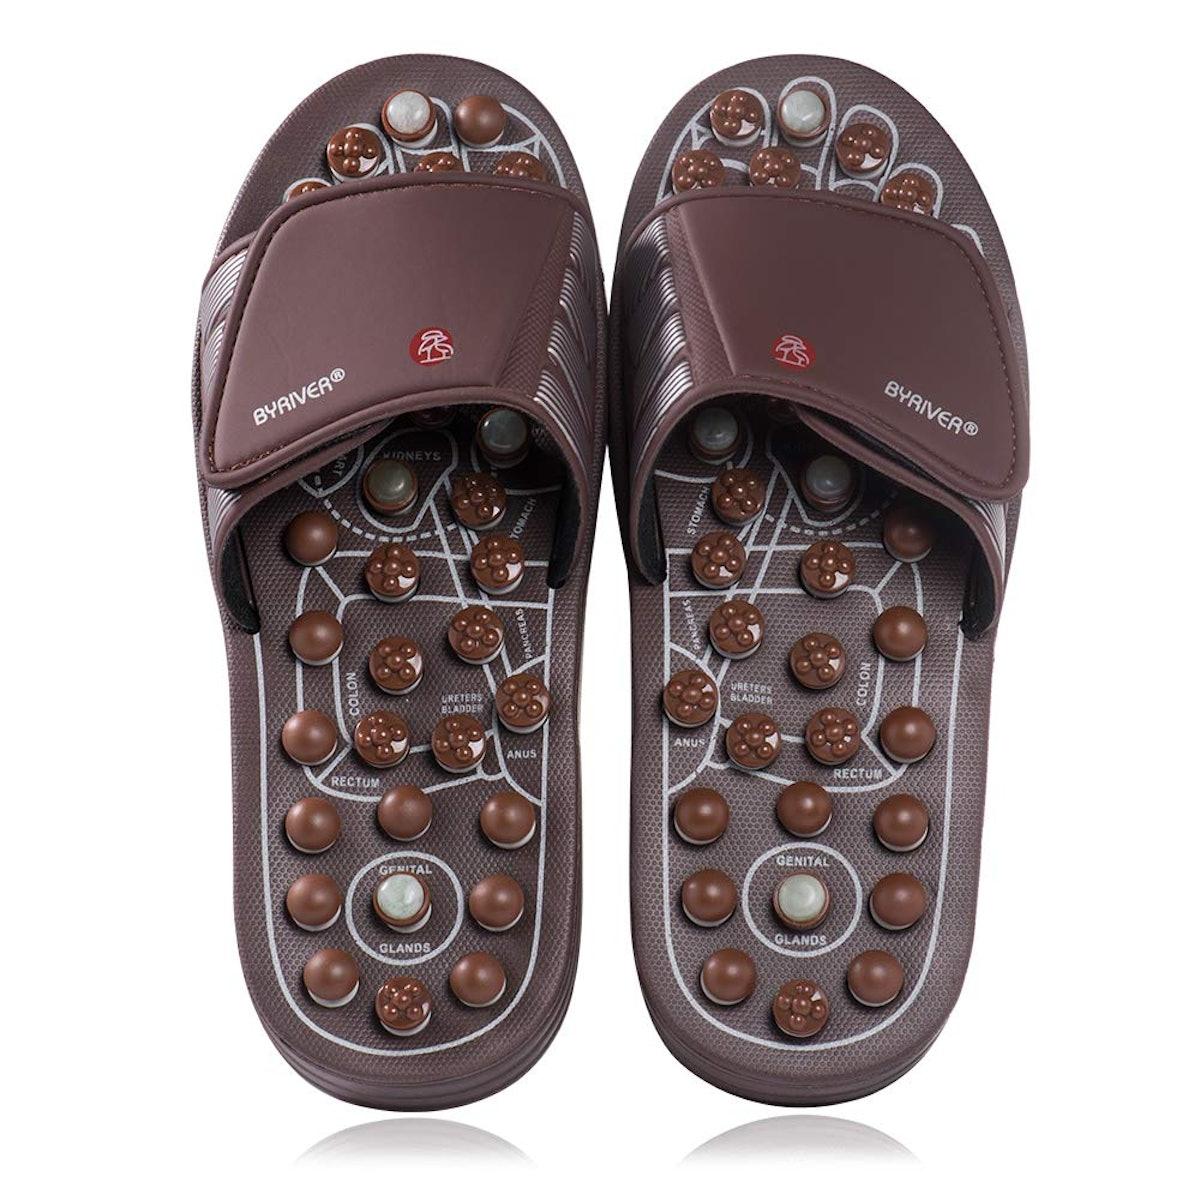 BYRIVER Acupressure Reflexology Slippers (Sizes 6.5-12)